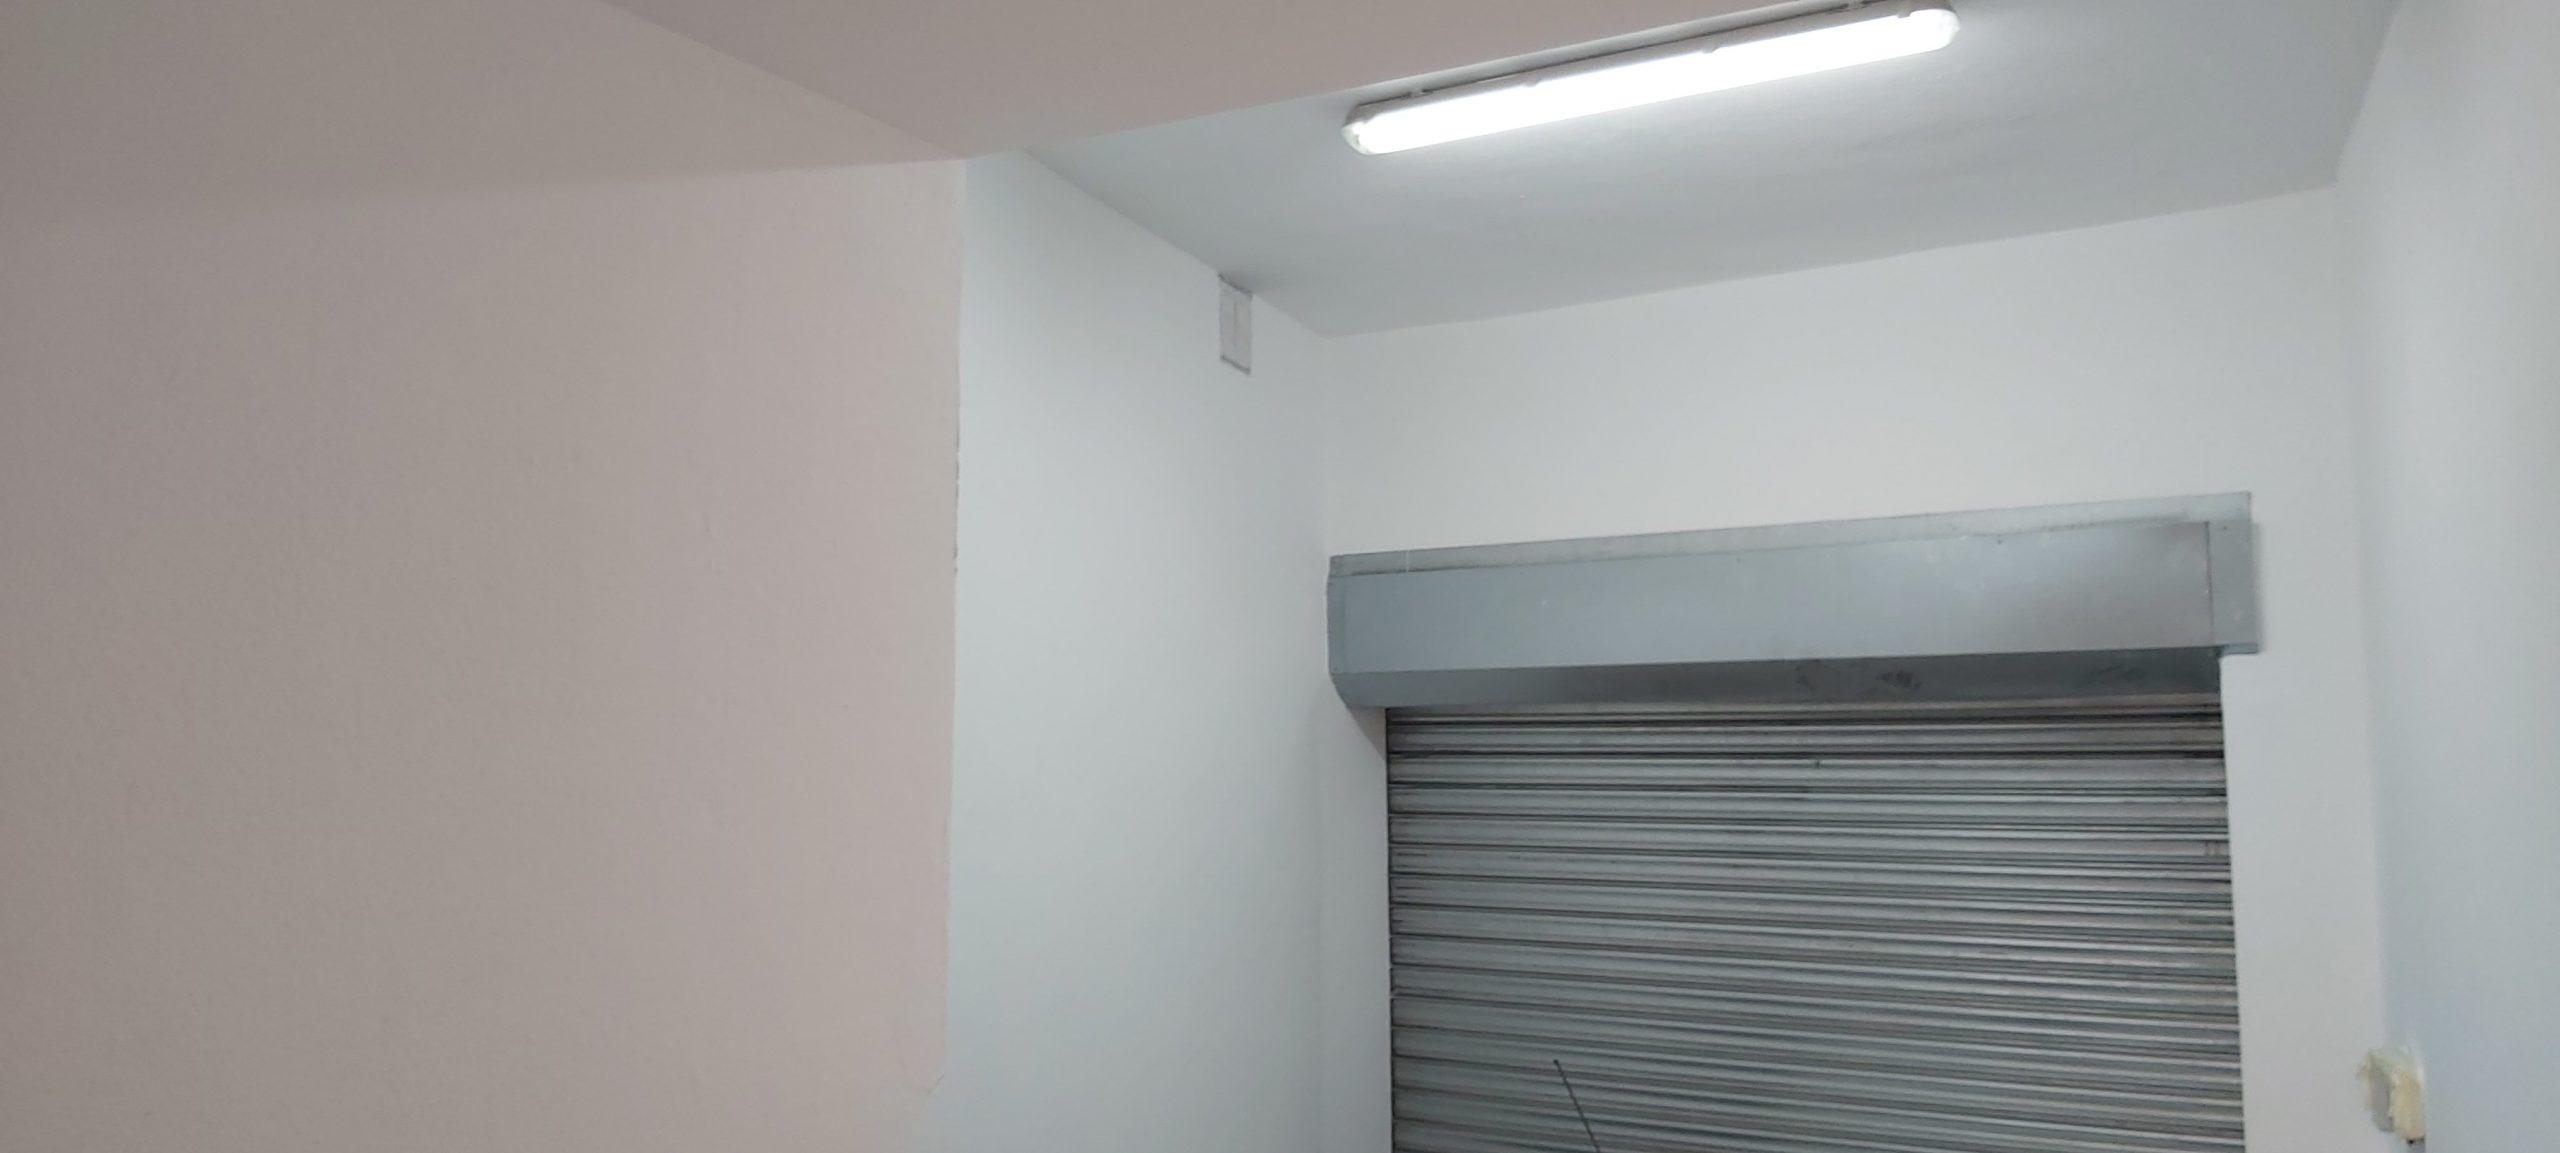 Pintar el interior de tu casa. Detalles